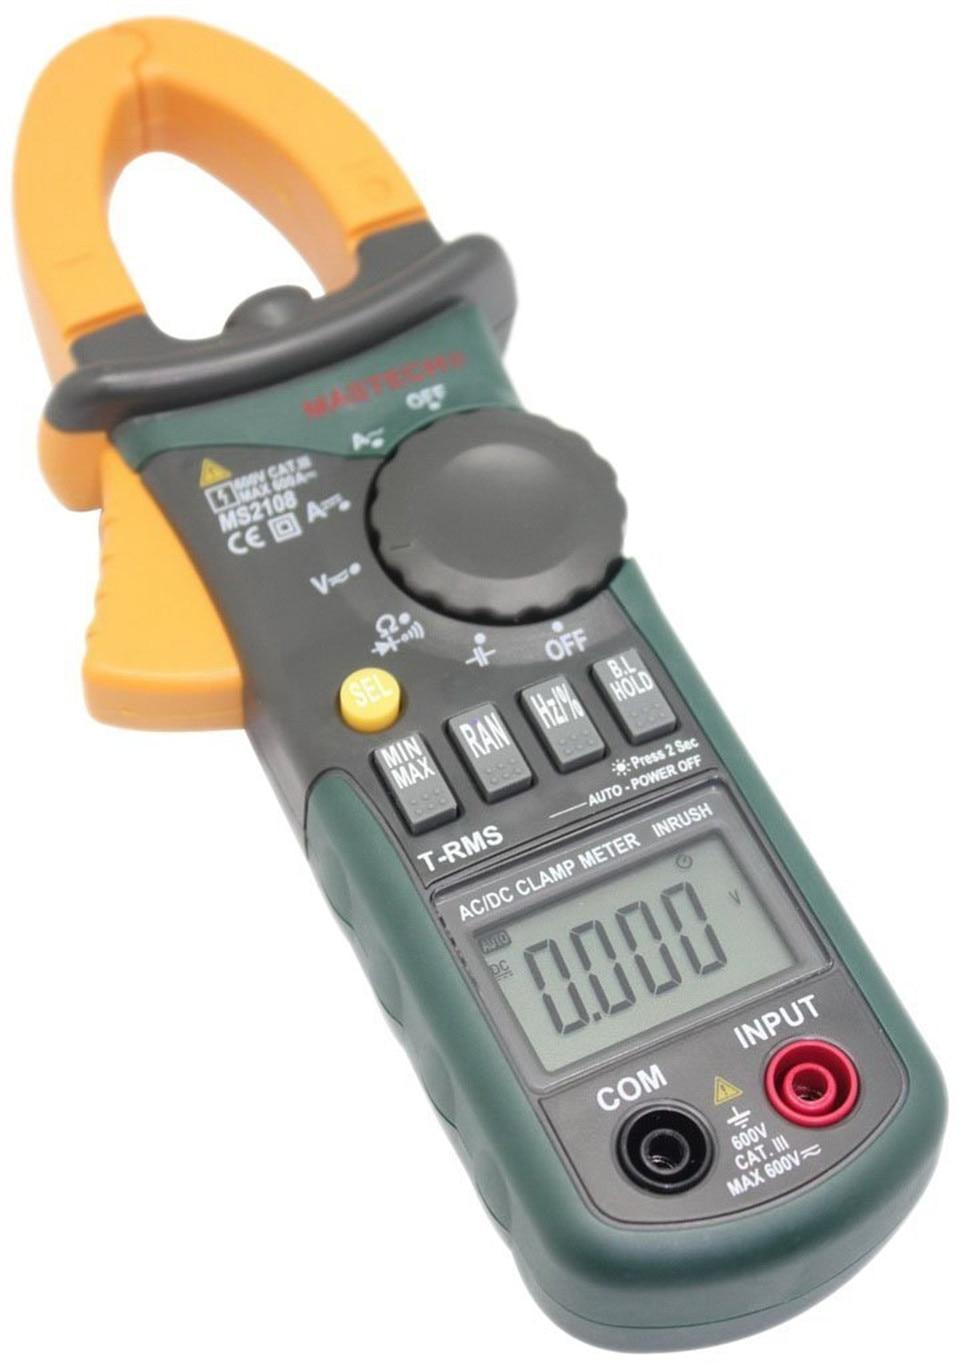 2017 New Mastech MS2108 Digital Clamp Meter True RMS LCD Multimeter AC DC Voltmeter Ammeter Ohm Herz. Duty Cycle Multi Tester  цены